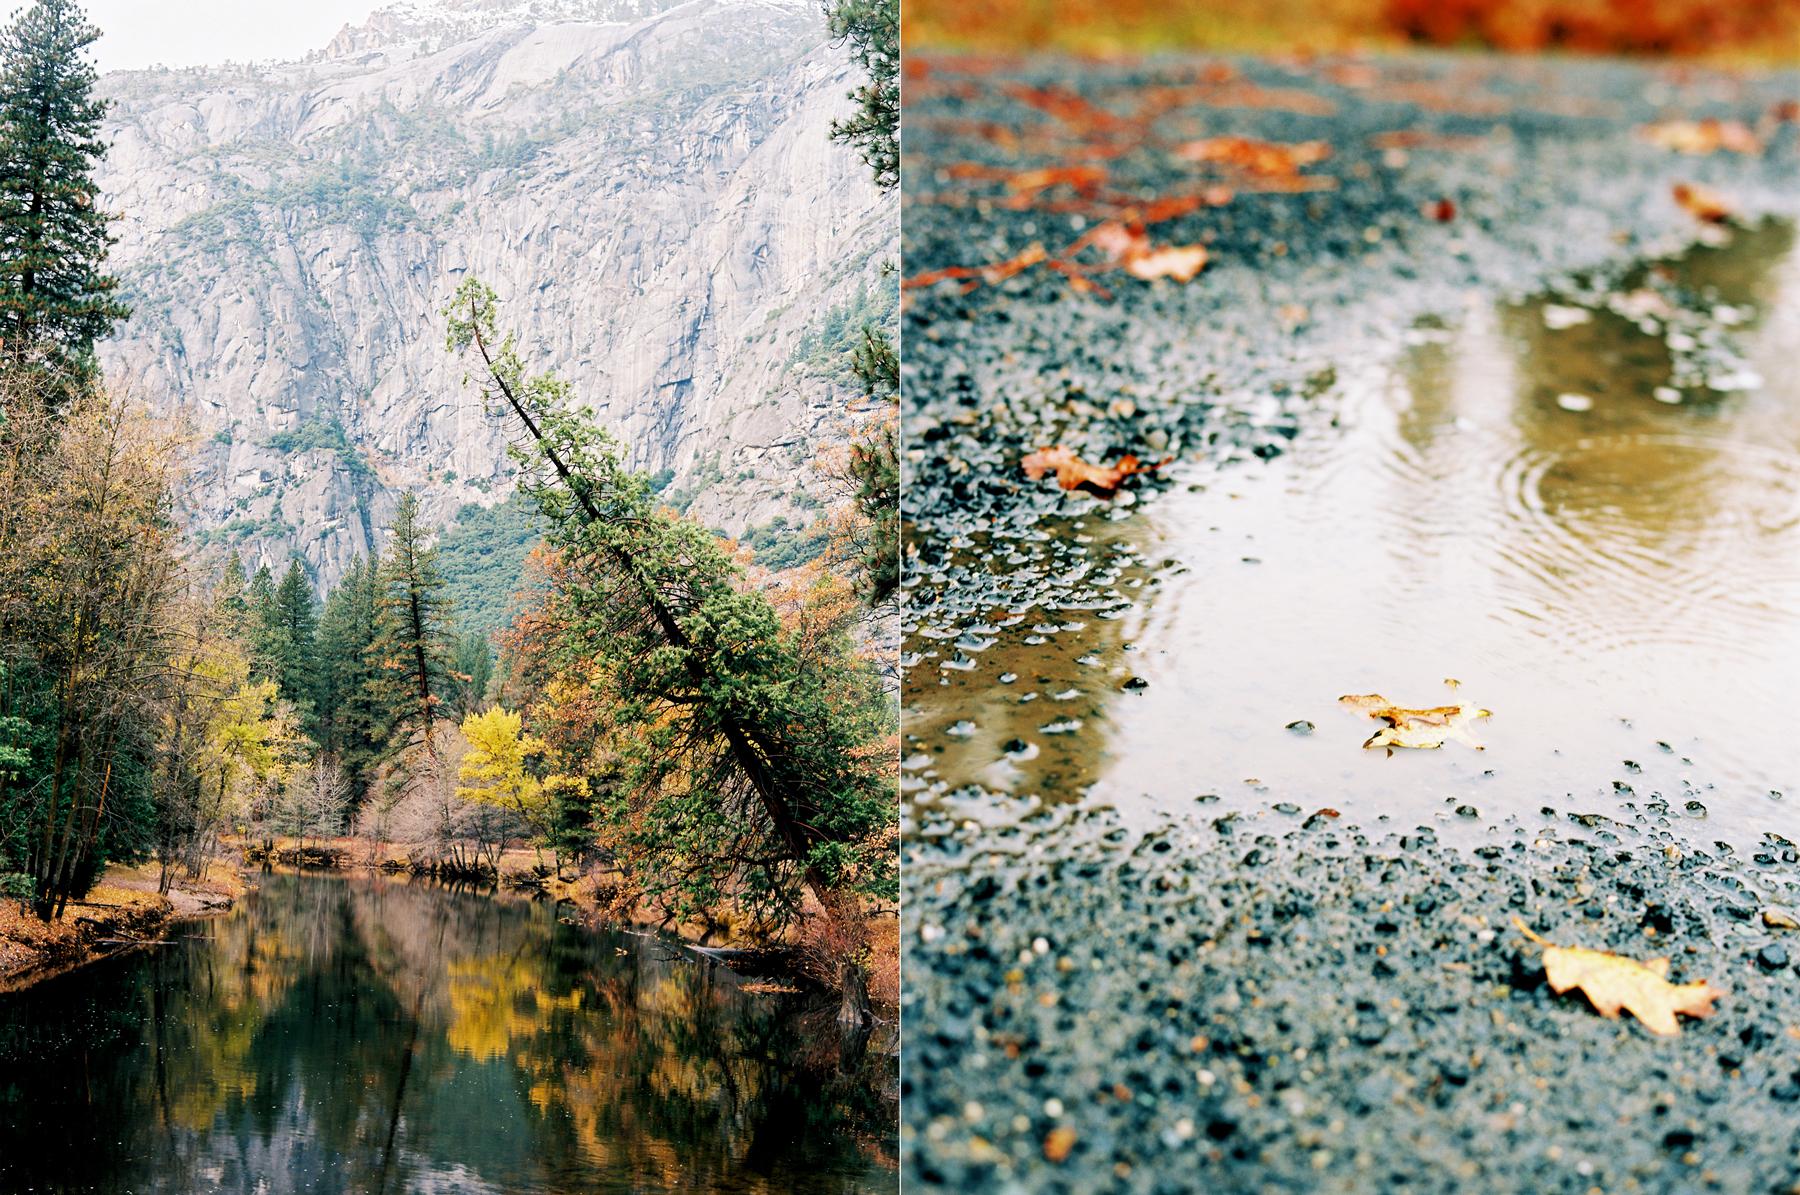 03sRGB-Inna-Kostukovsky-Yosemite.jpg